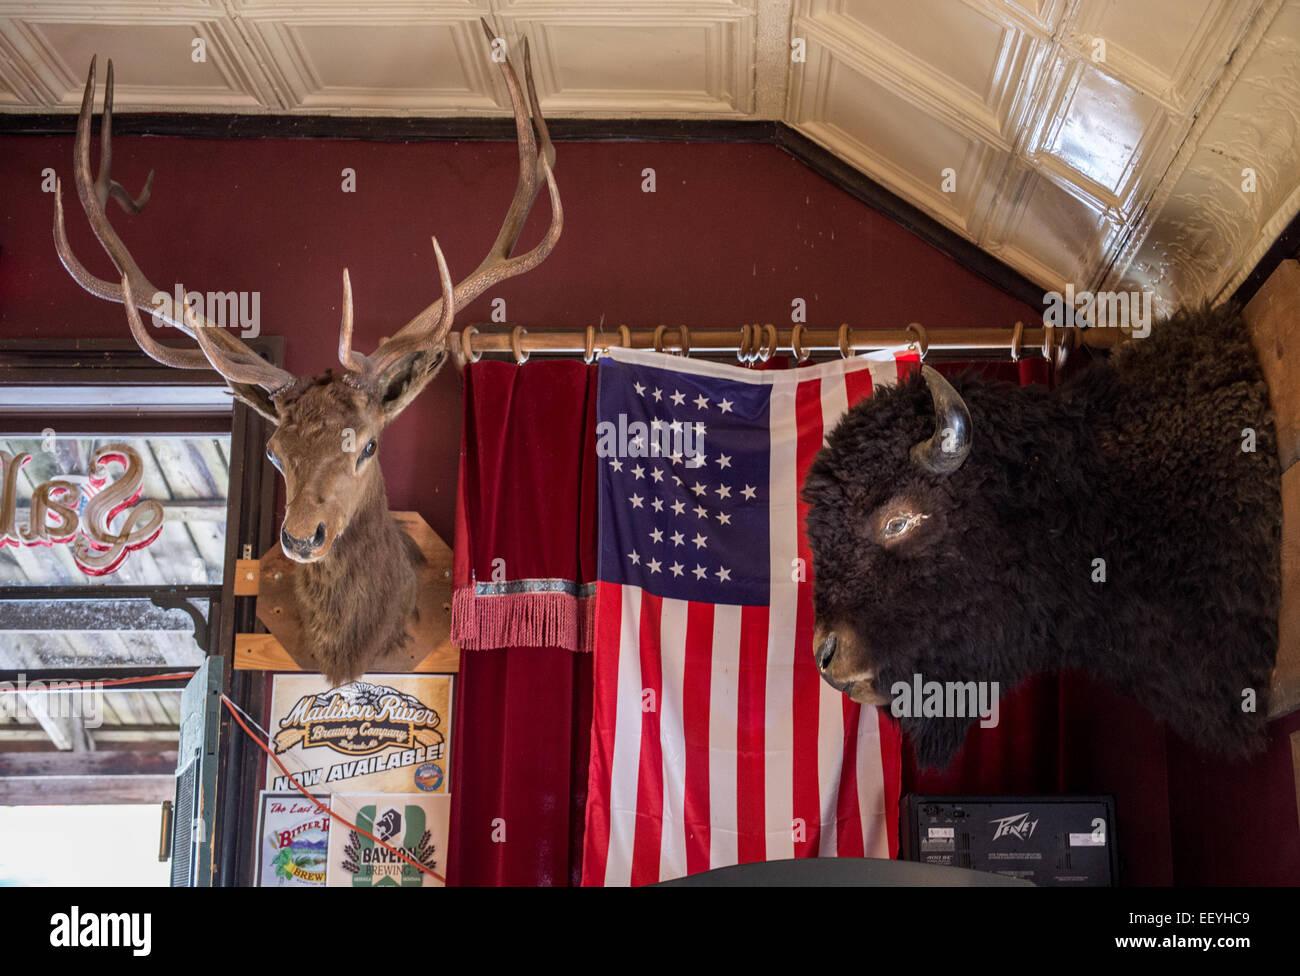 Tourists enjoy summer fun in Virginia City, Montana. (Photo by Ami Vitale) - Stock Image